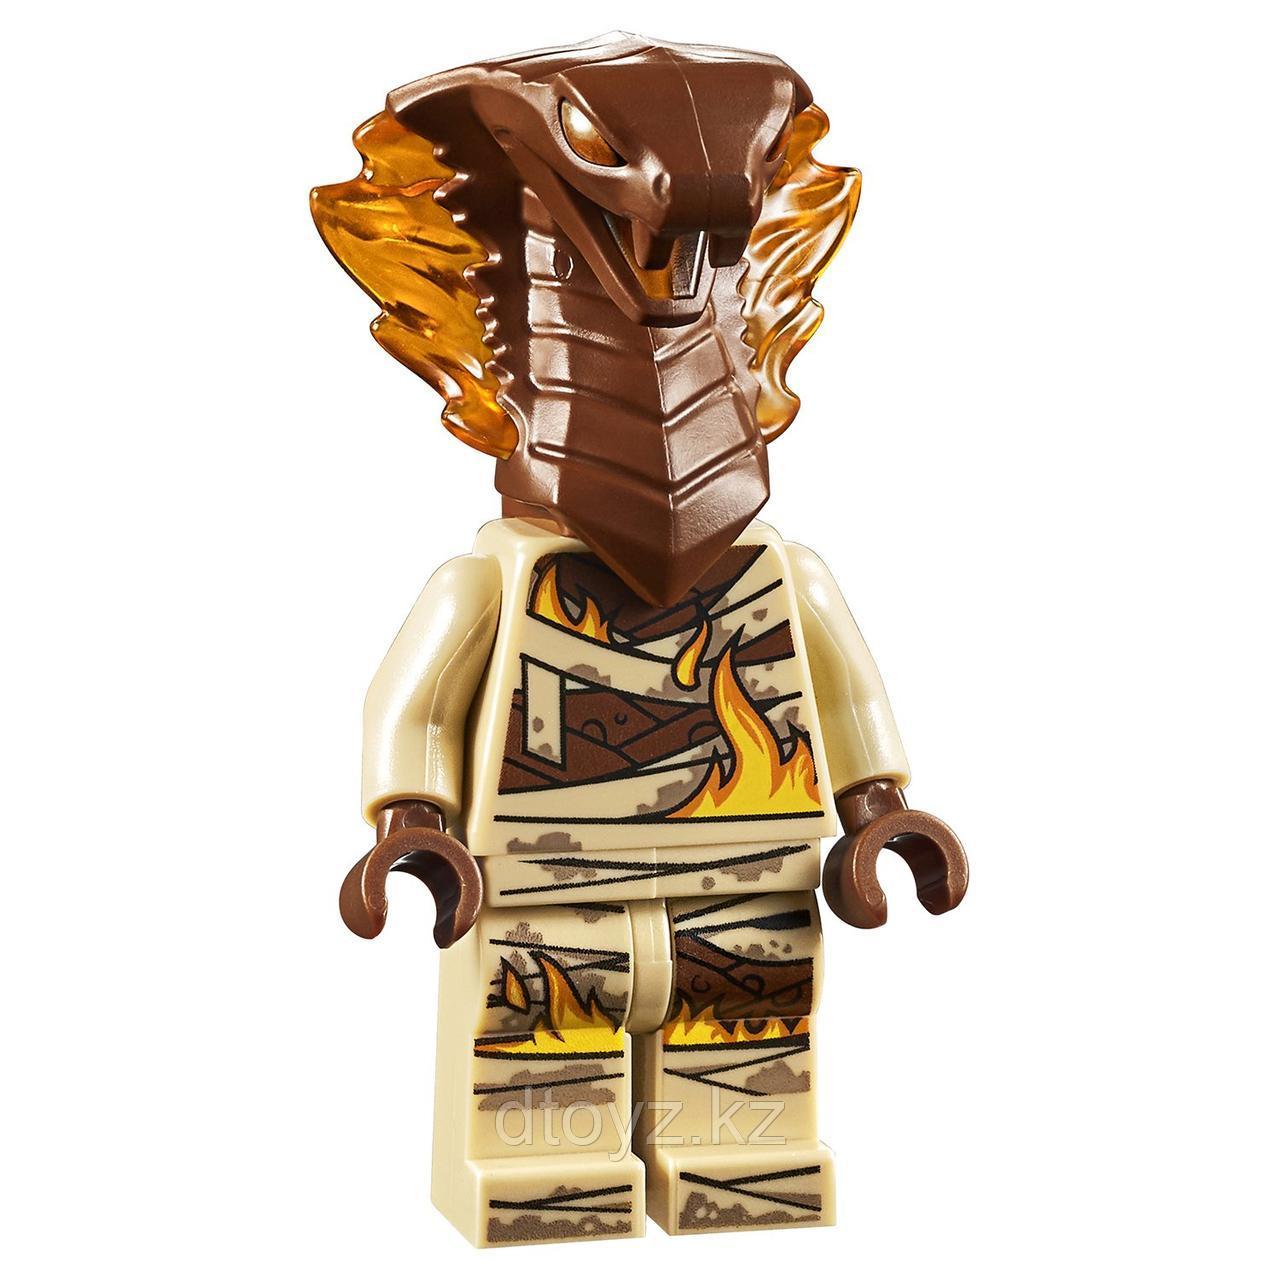 Lego Ninjago 70674 Огненный кинжал, Лего Ниндзяго - фото 8